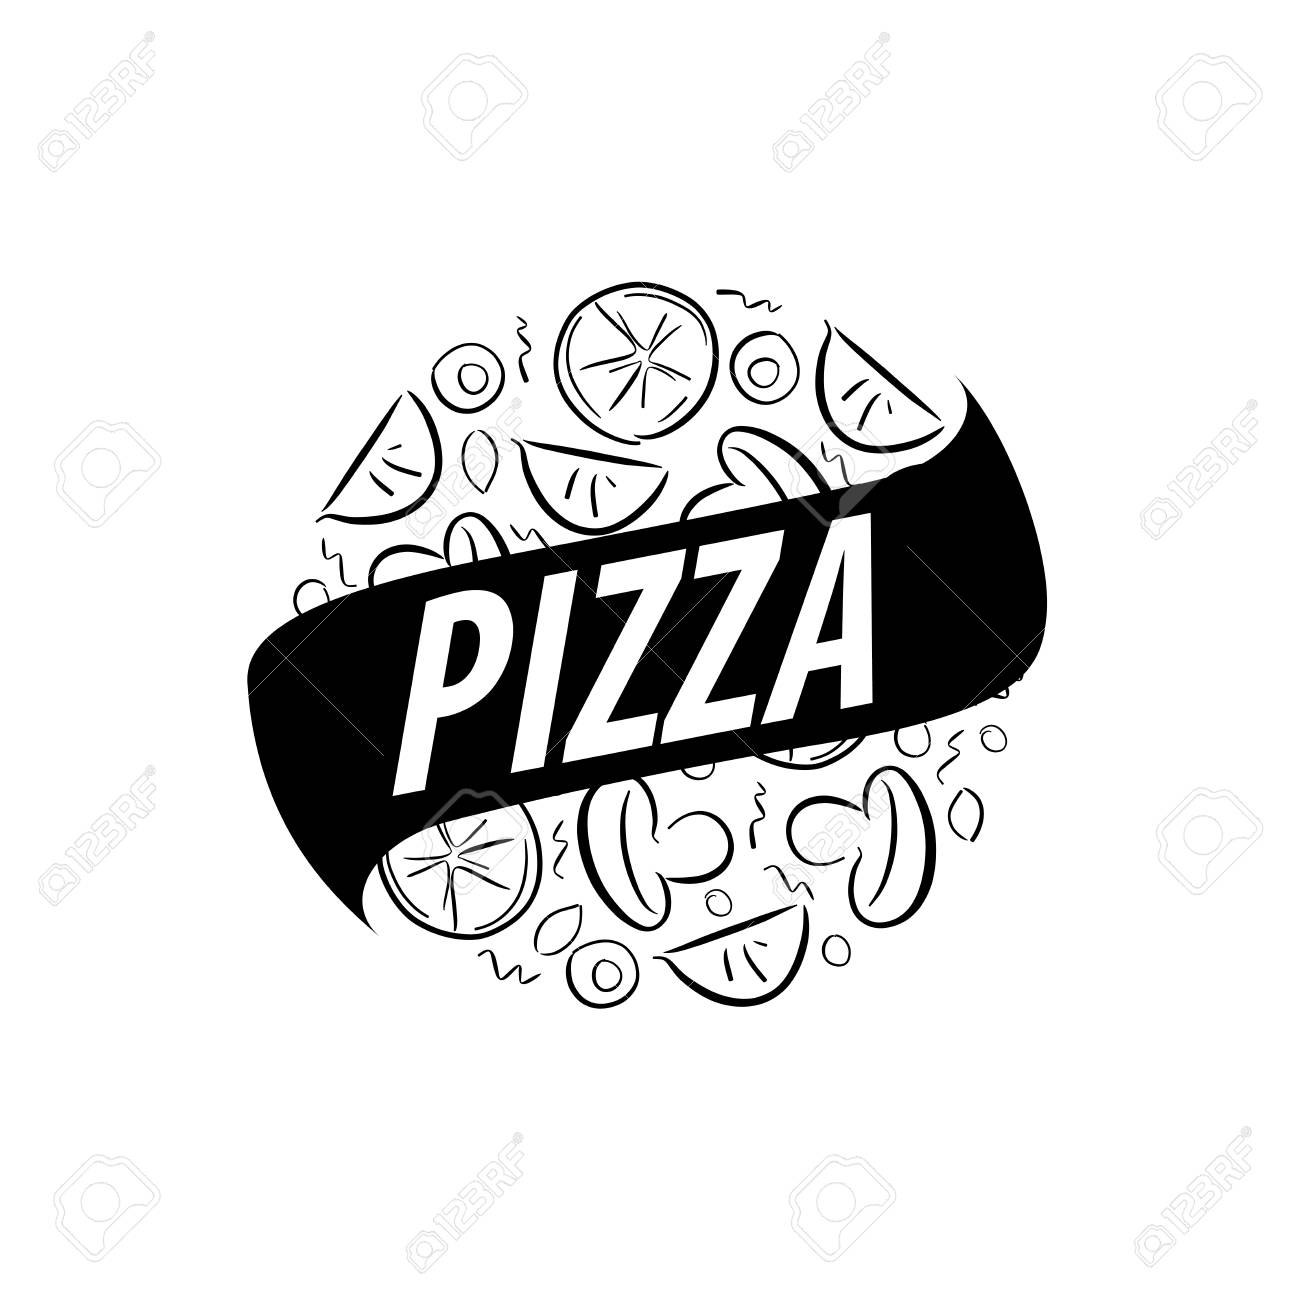 pizza vector logo royalty free cliparts vectors and stock rh 123rf com pizza vector png pizza vector free